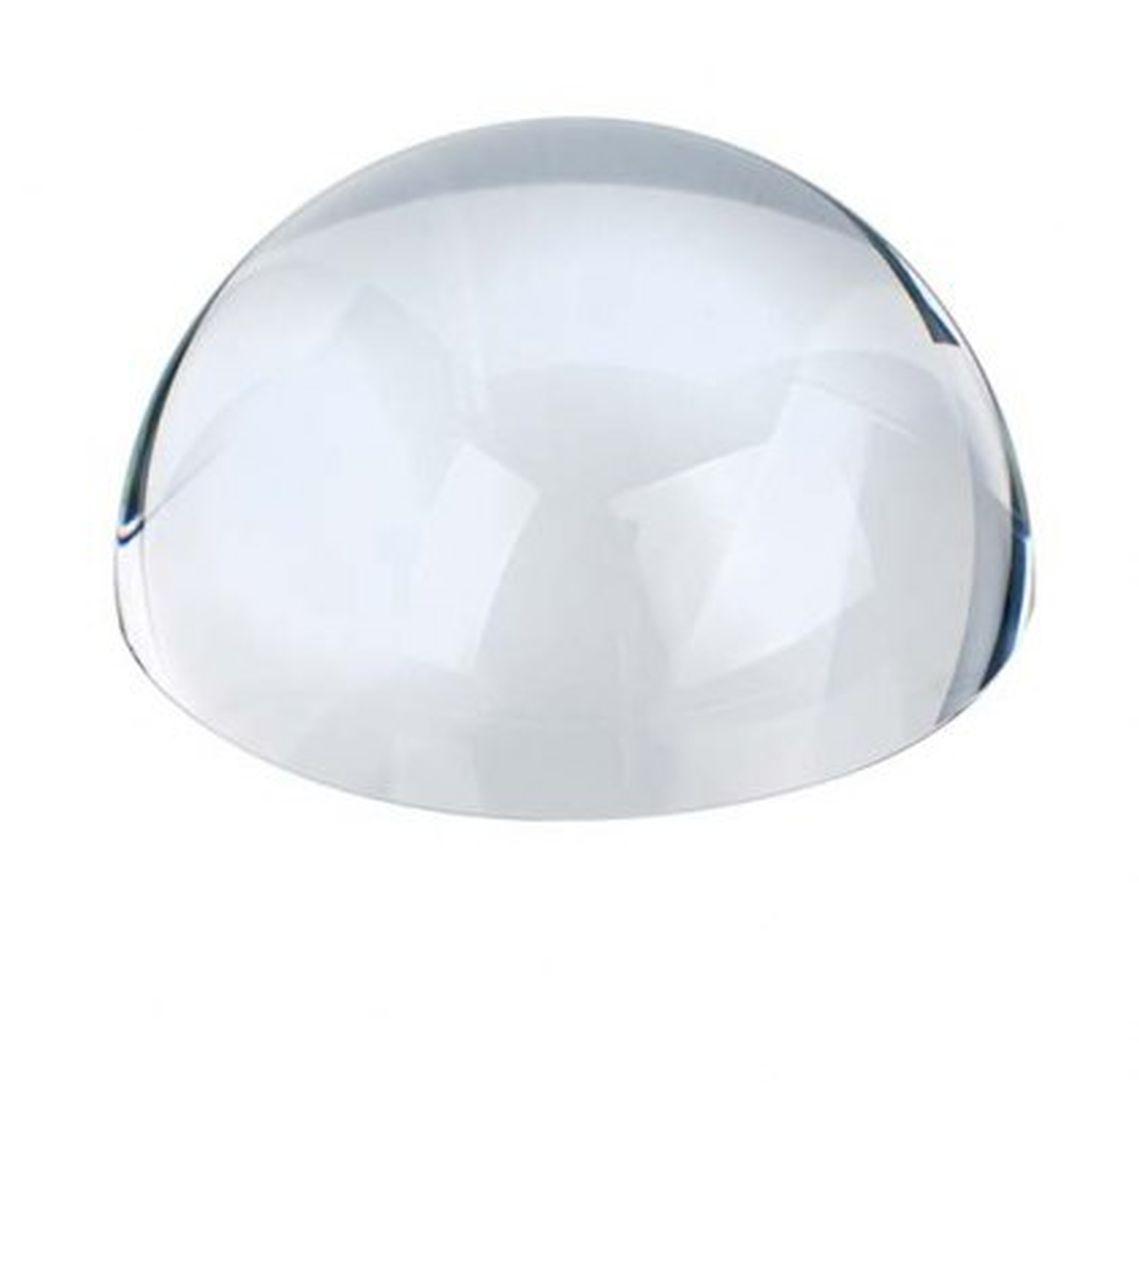 Fermacarte lente mezza sfera in vetro trasparente cm.3,5h diam.7